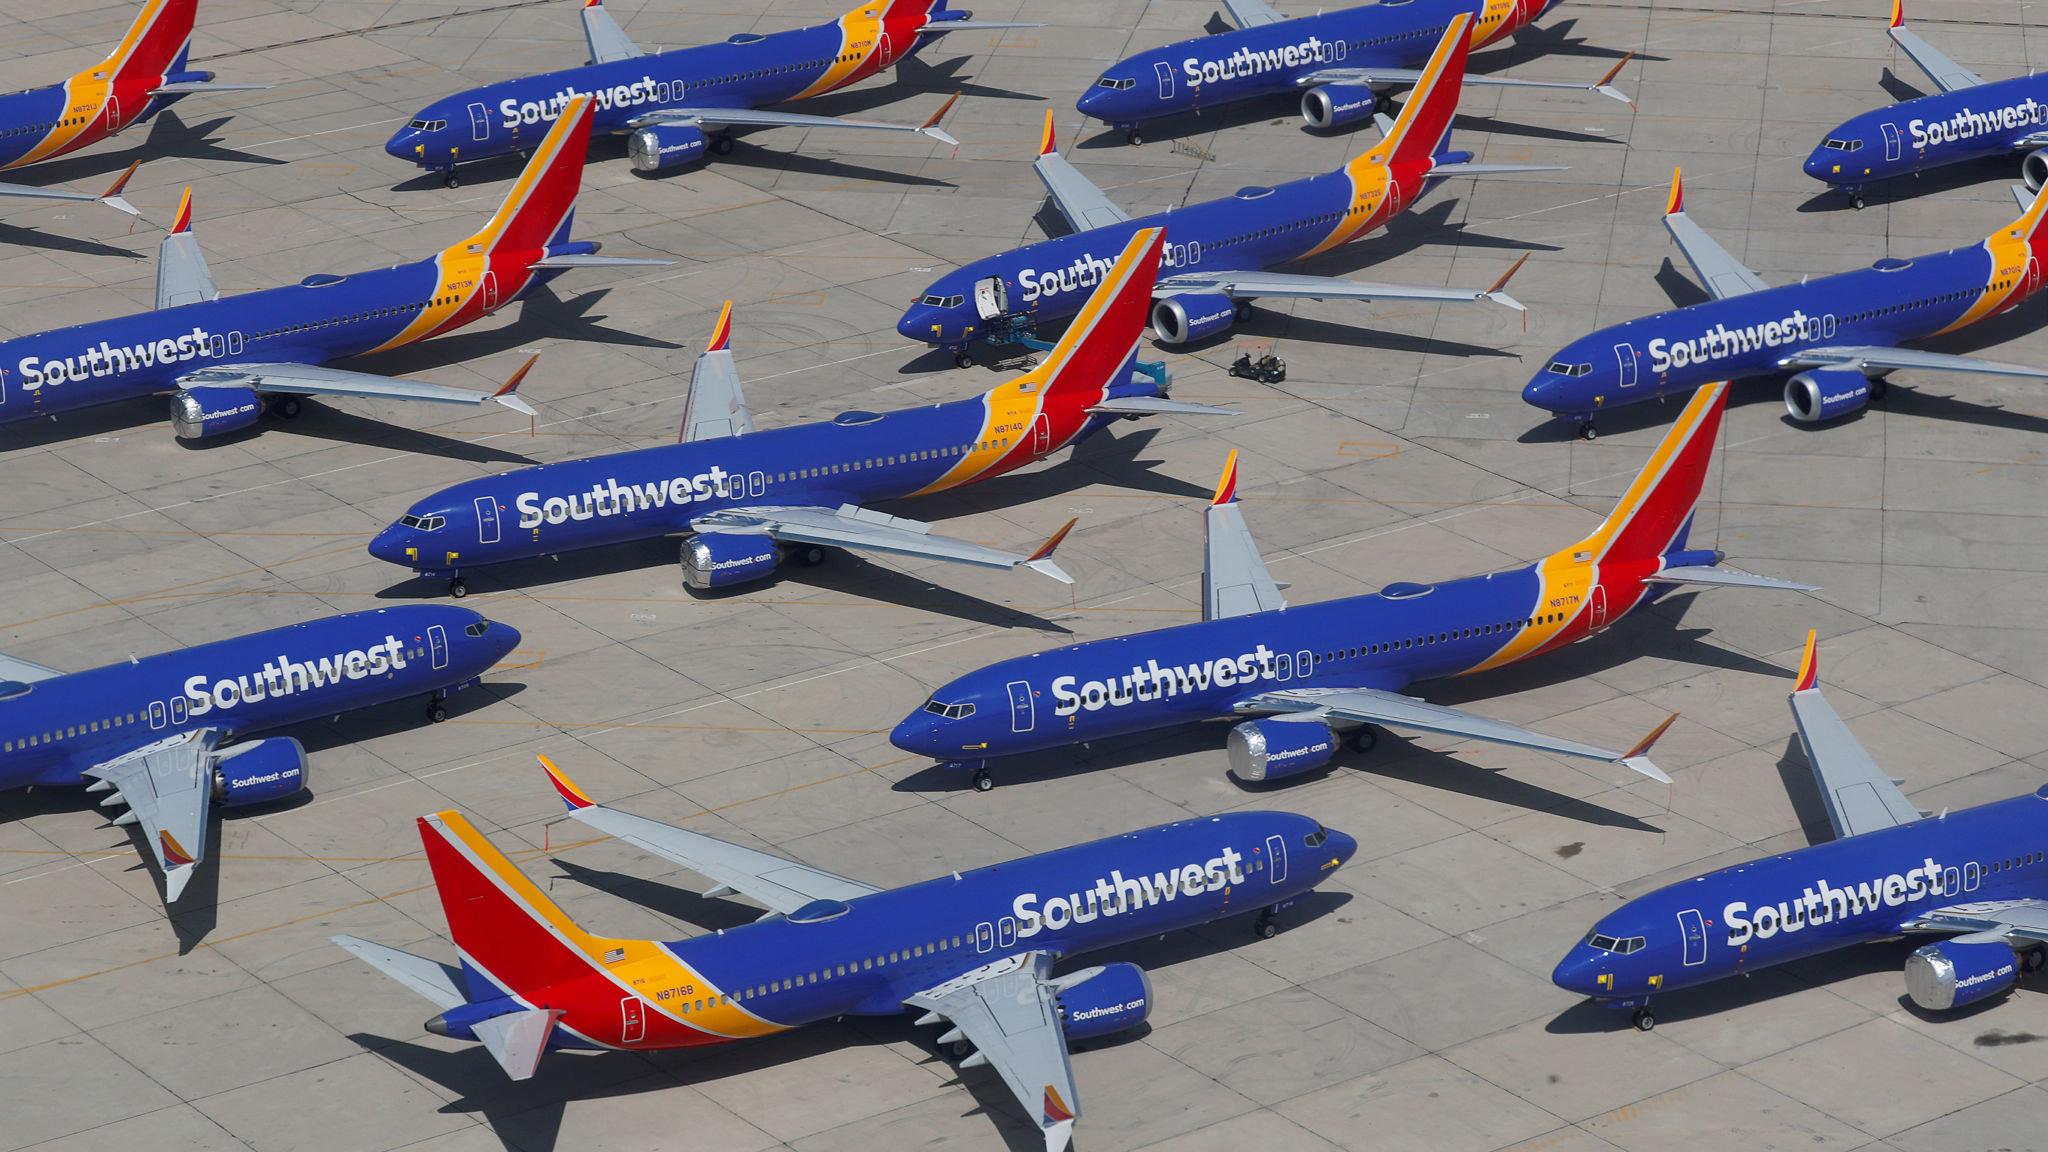 Boeing admits flaw in 737 Max flight simulator | Financial Times